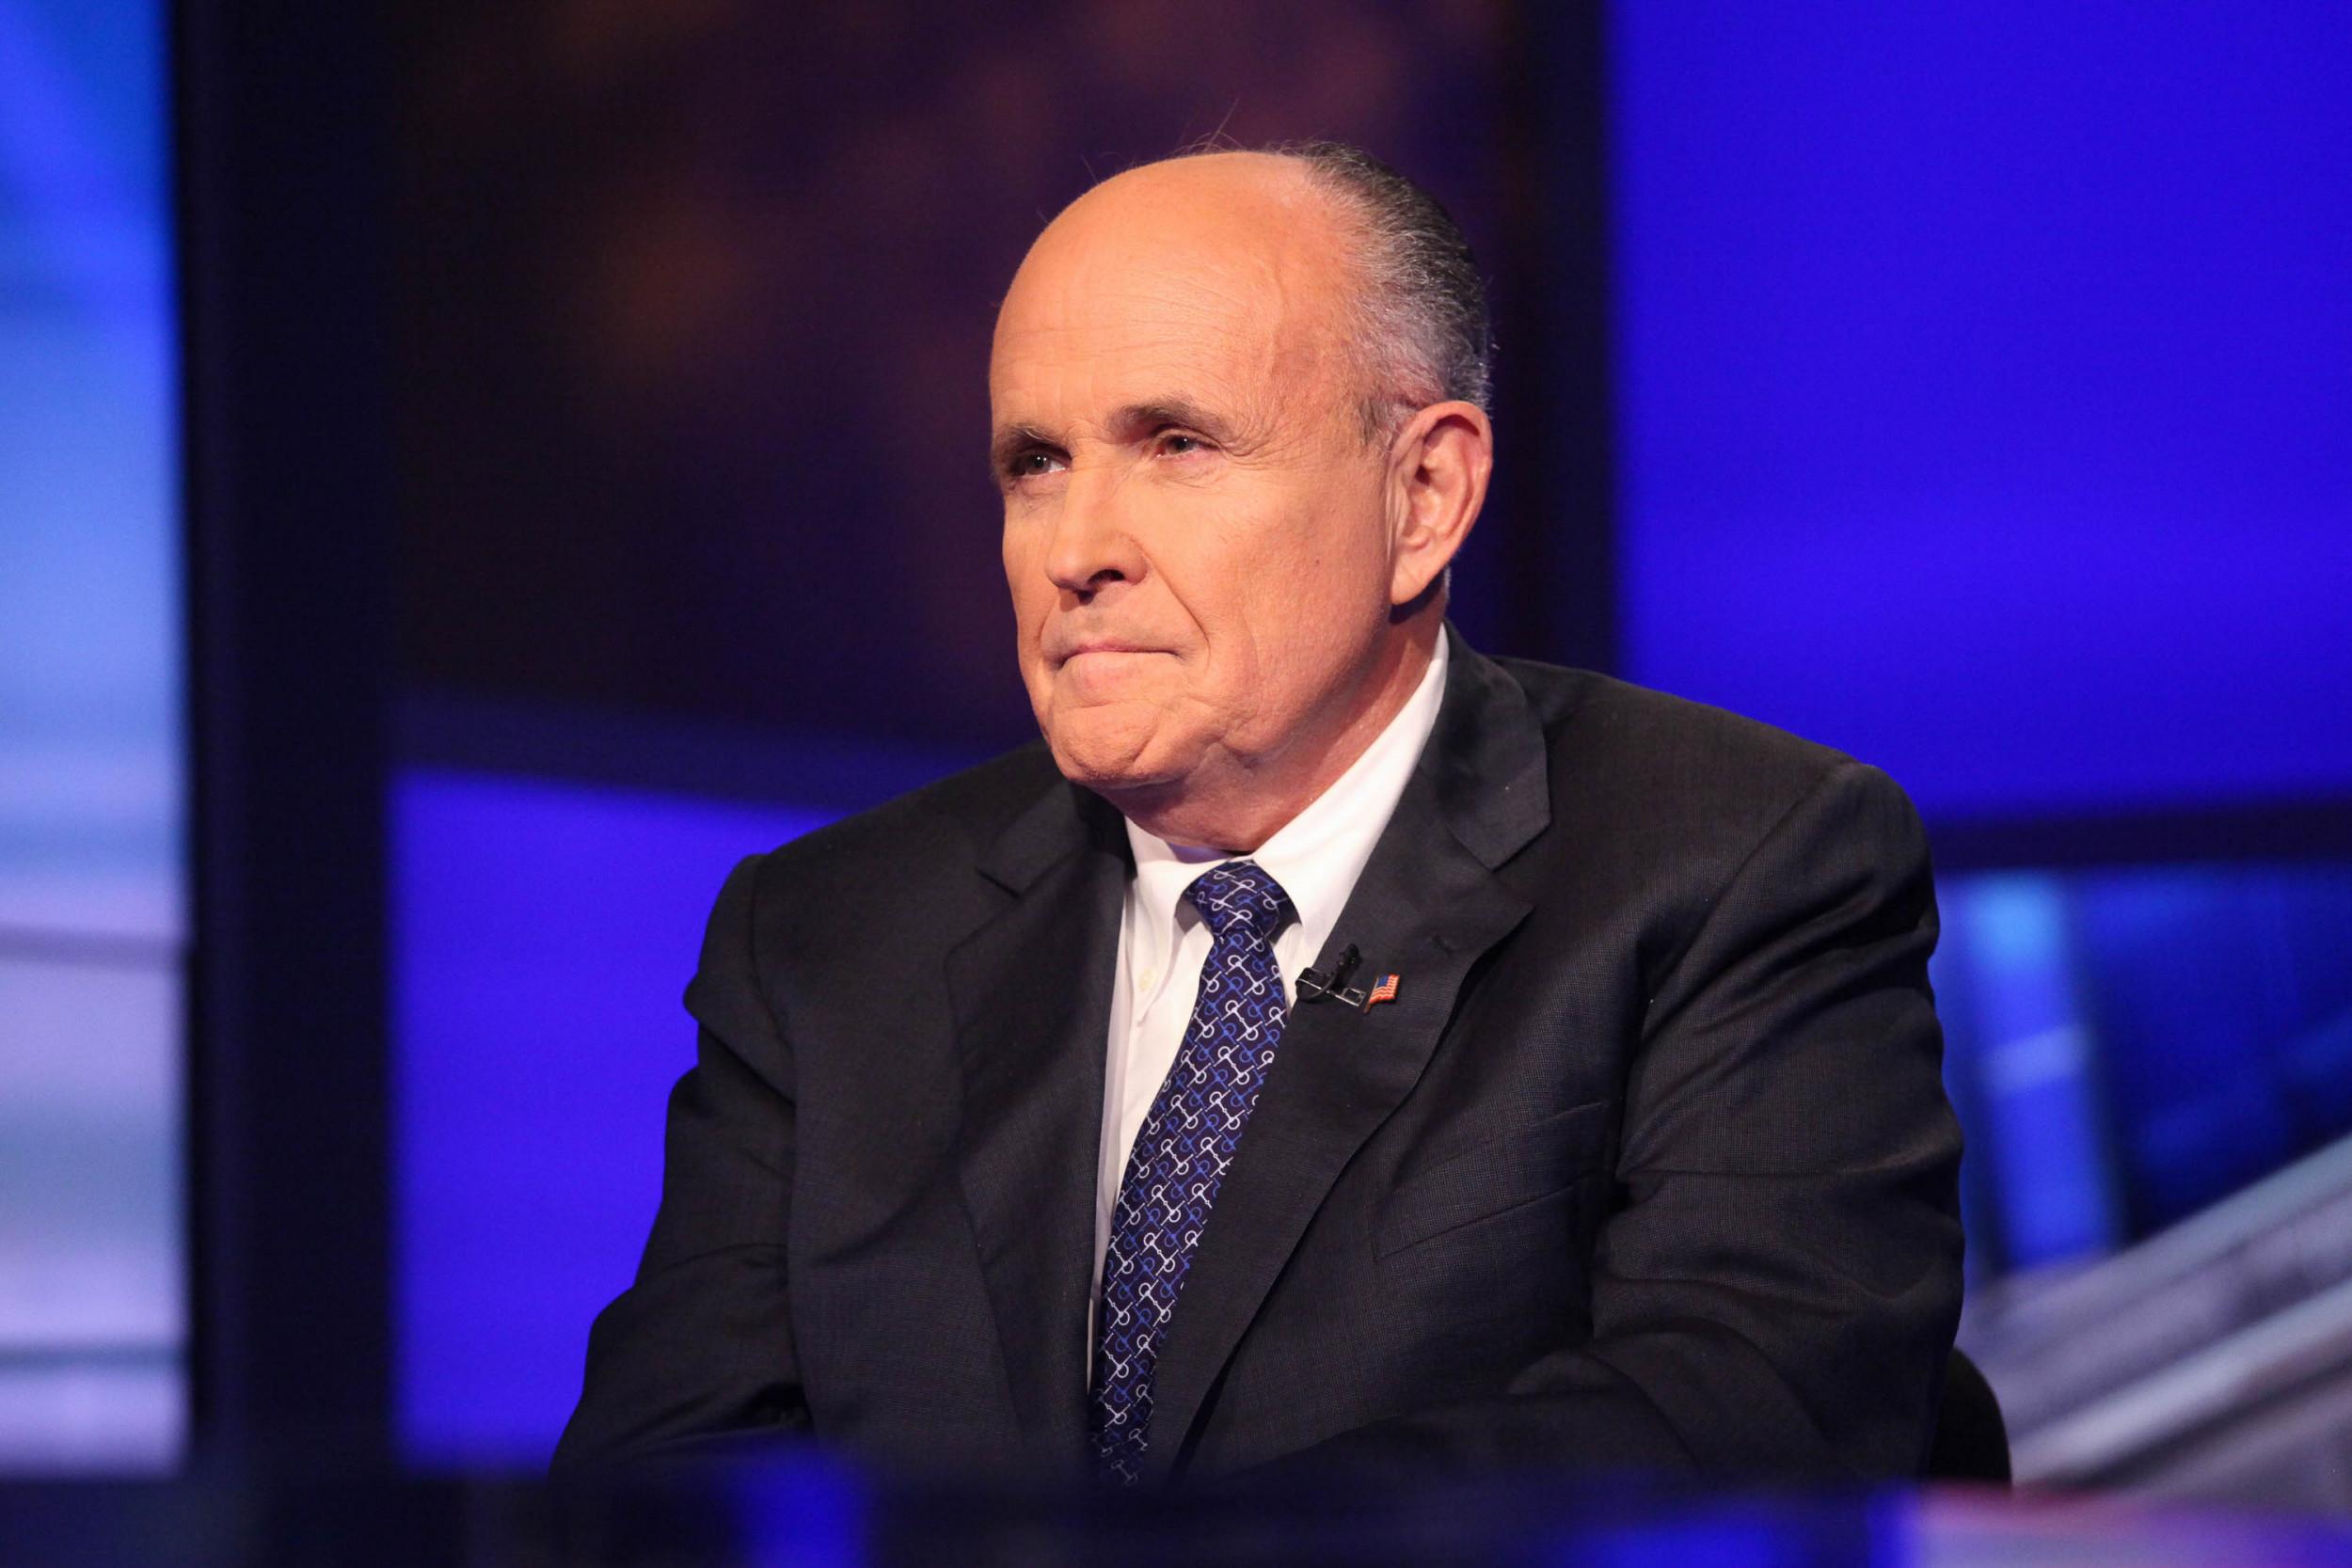 newsweek.com - Chantal Da Silva - Rudy Giuliani may pose a national security threat to the U.S., says former FBI agent